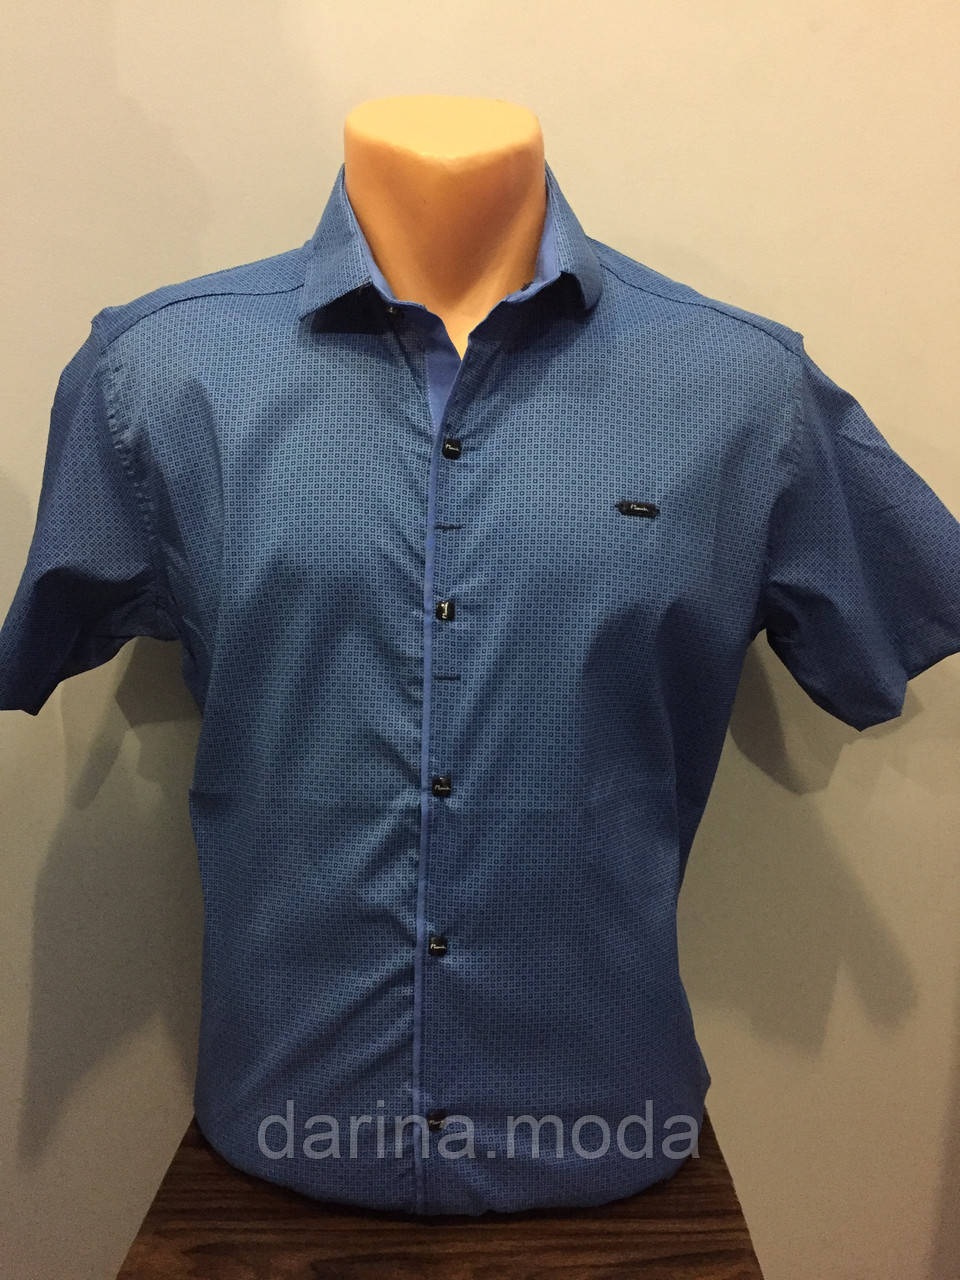 Рубашка с коротким рукавом для мужчины